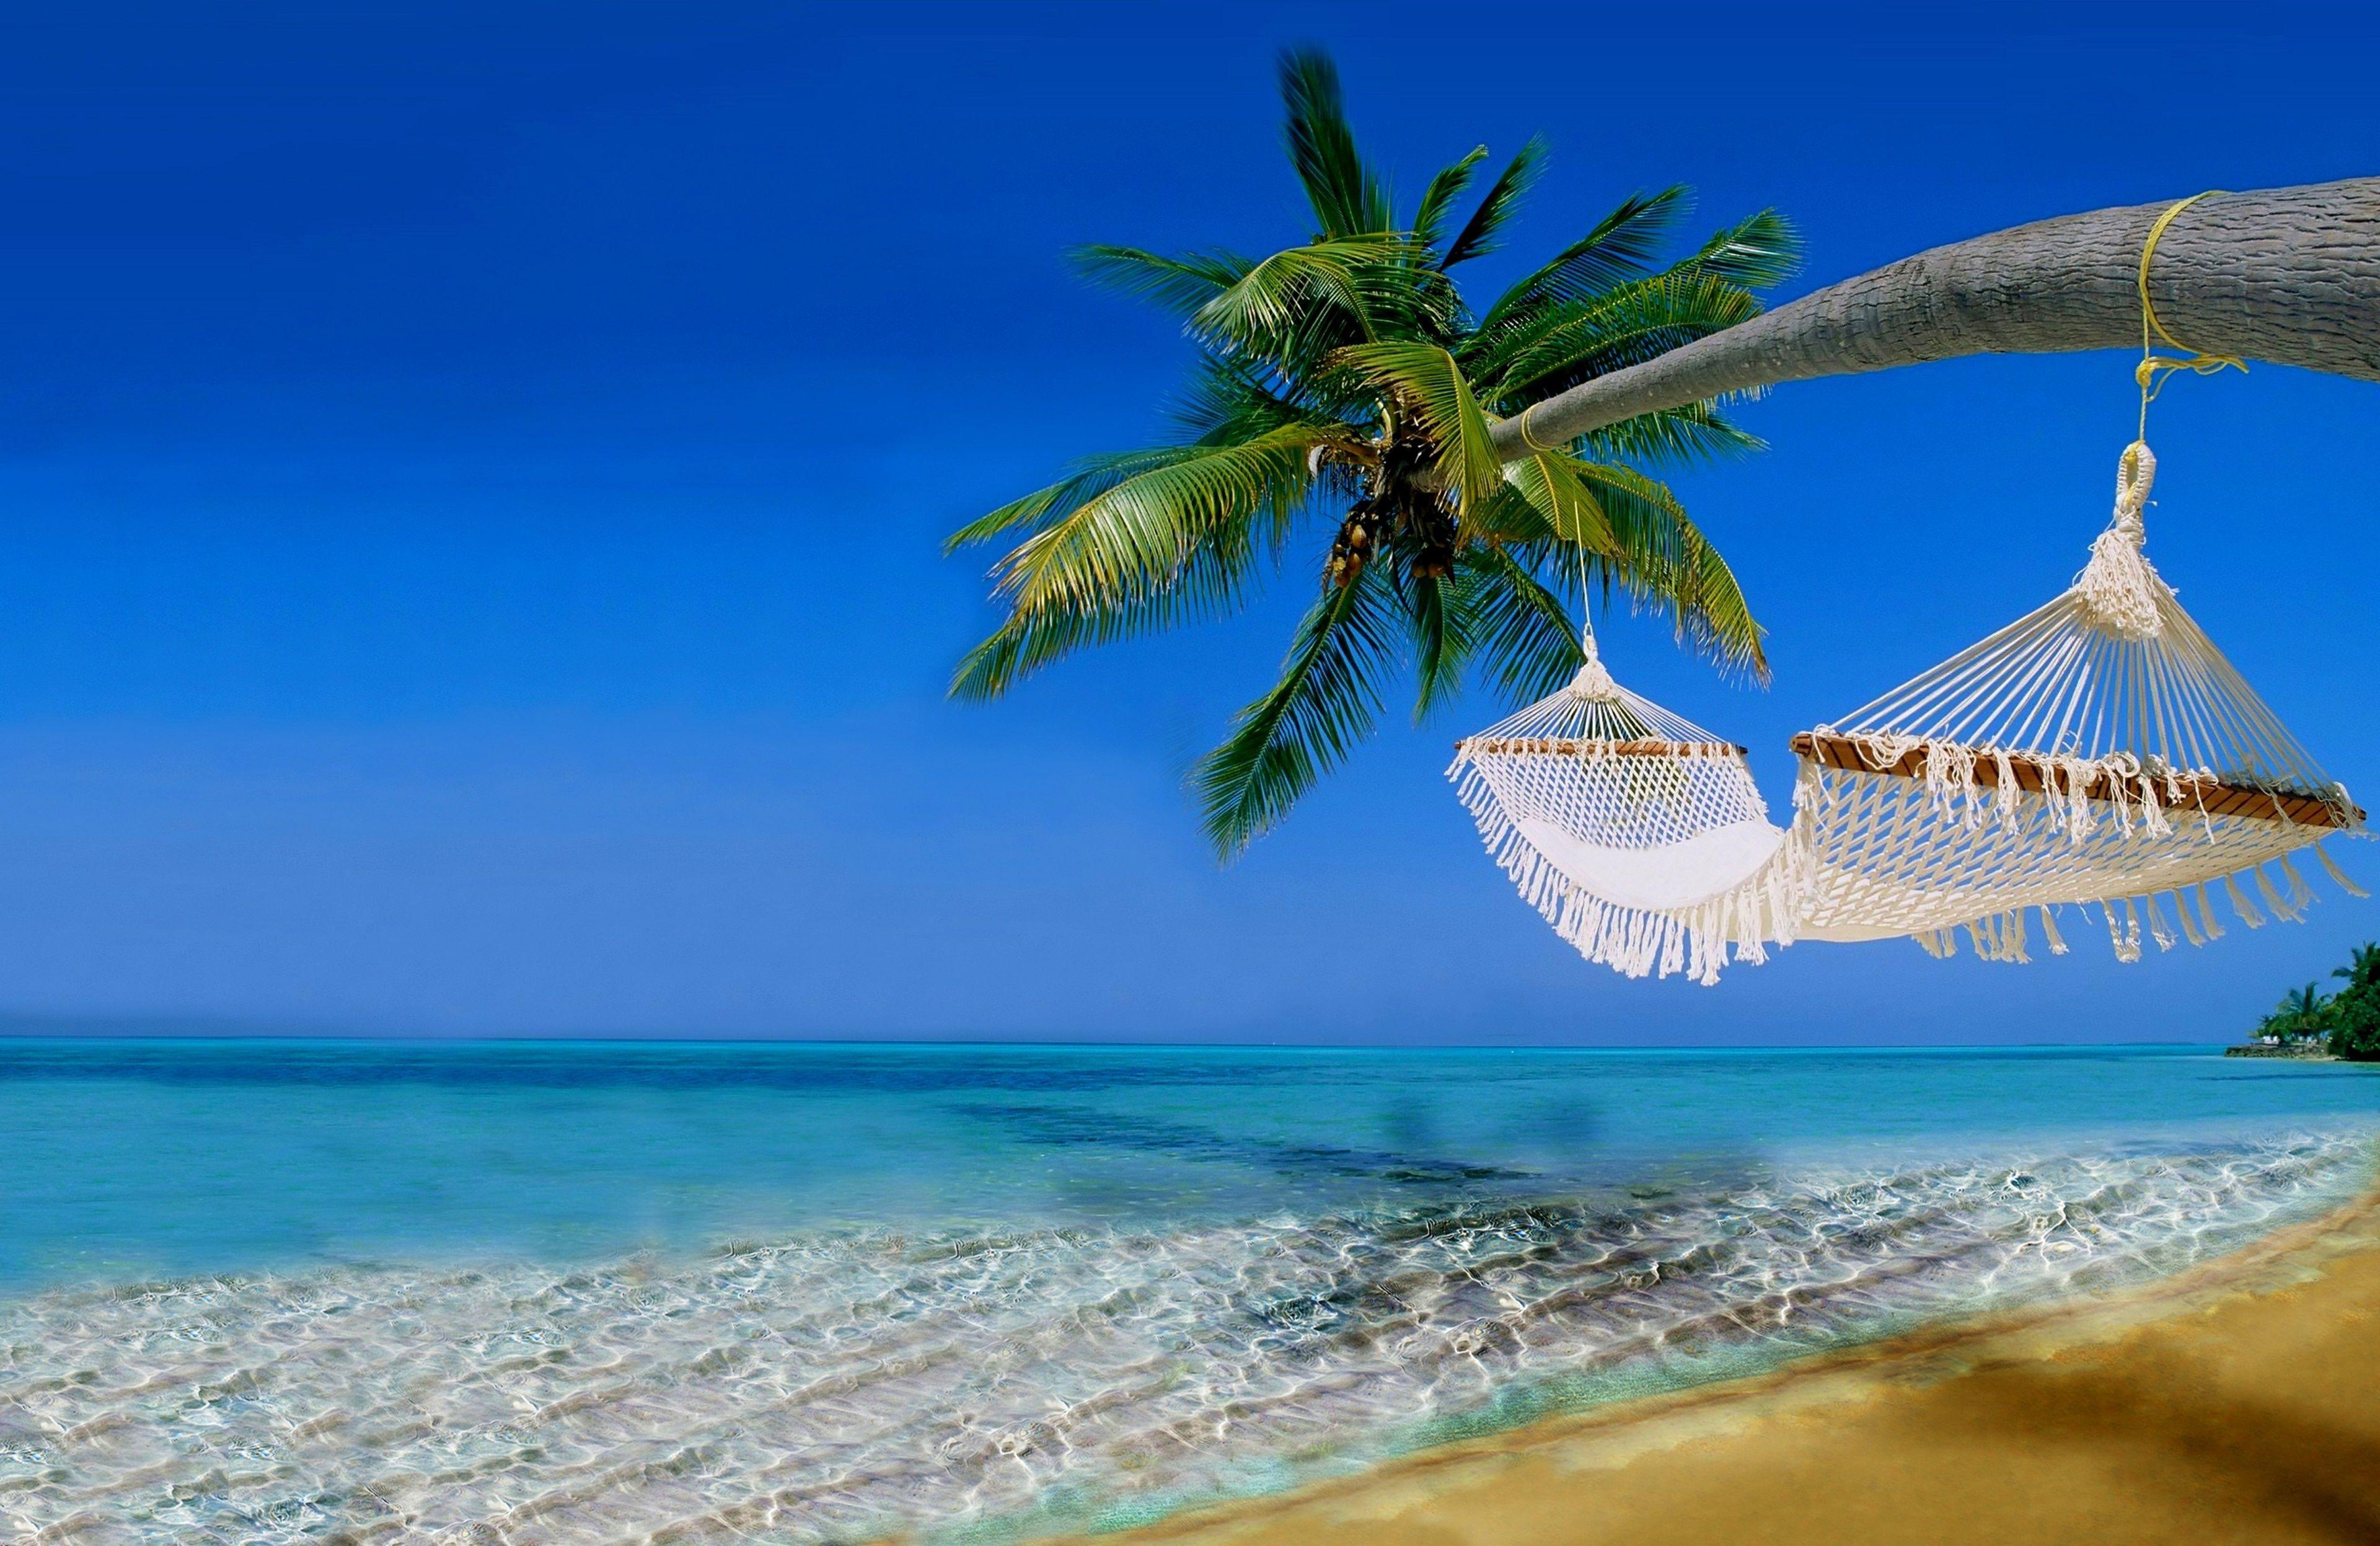 3840x2494 tropical beach 4k full screen wallpaper for